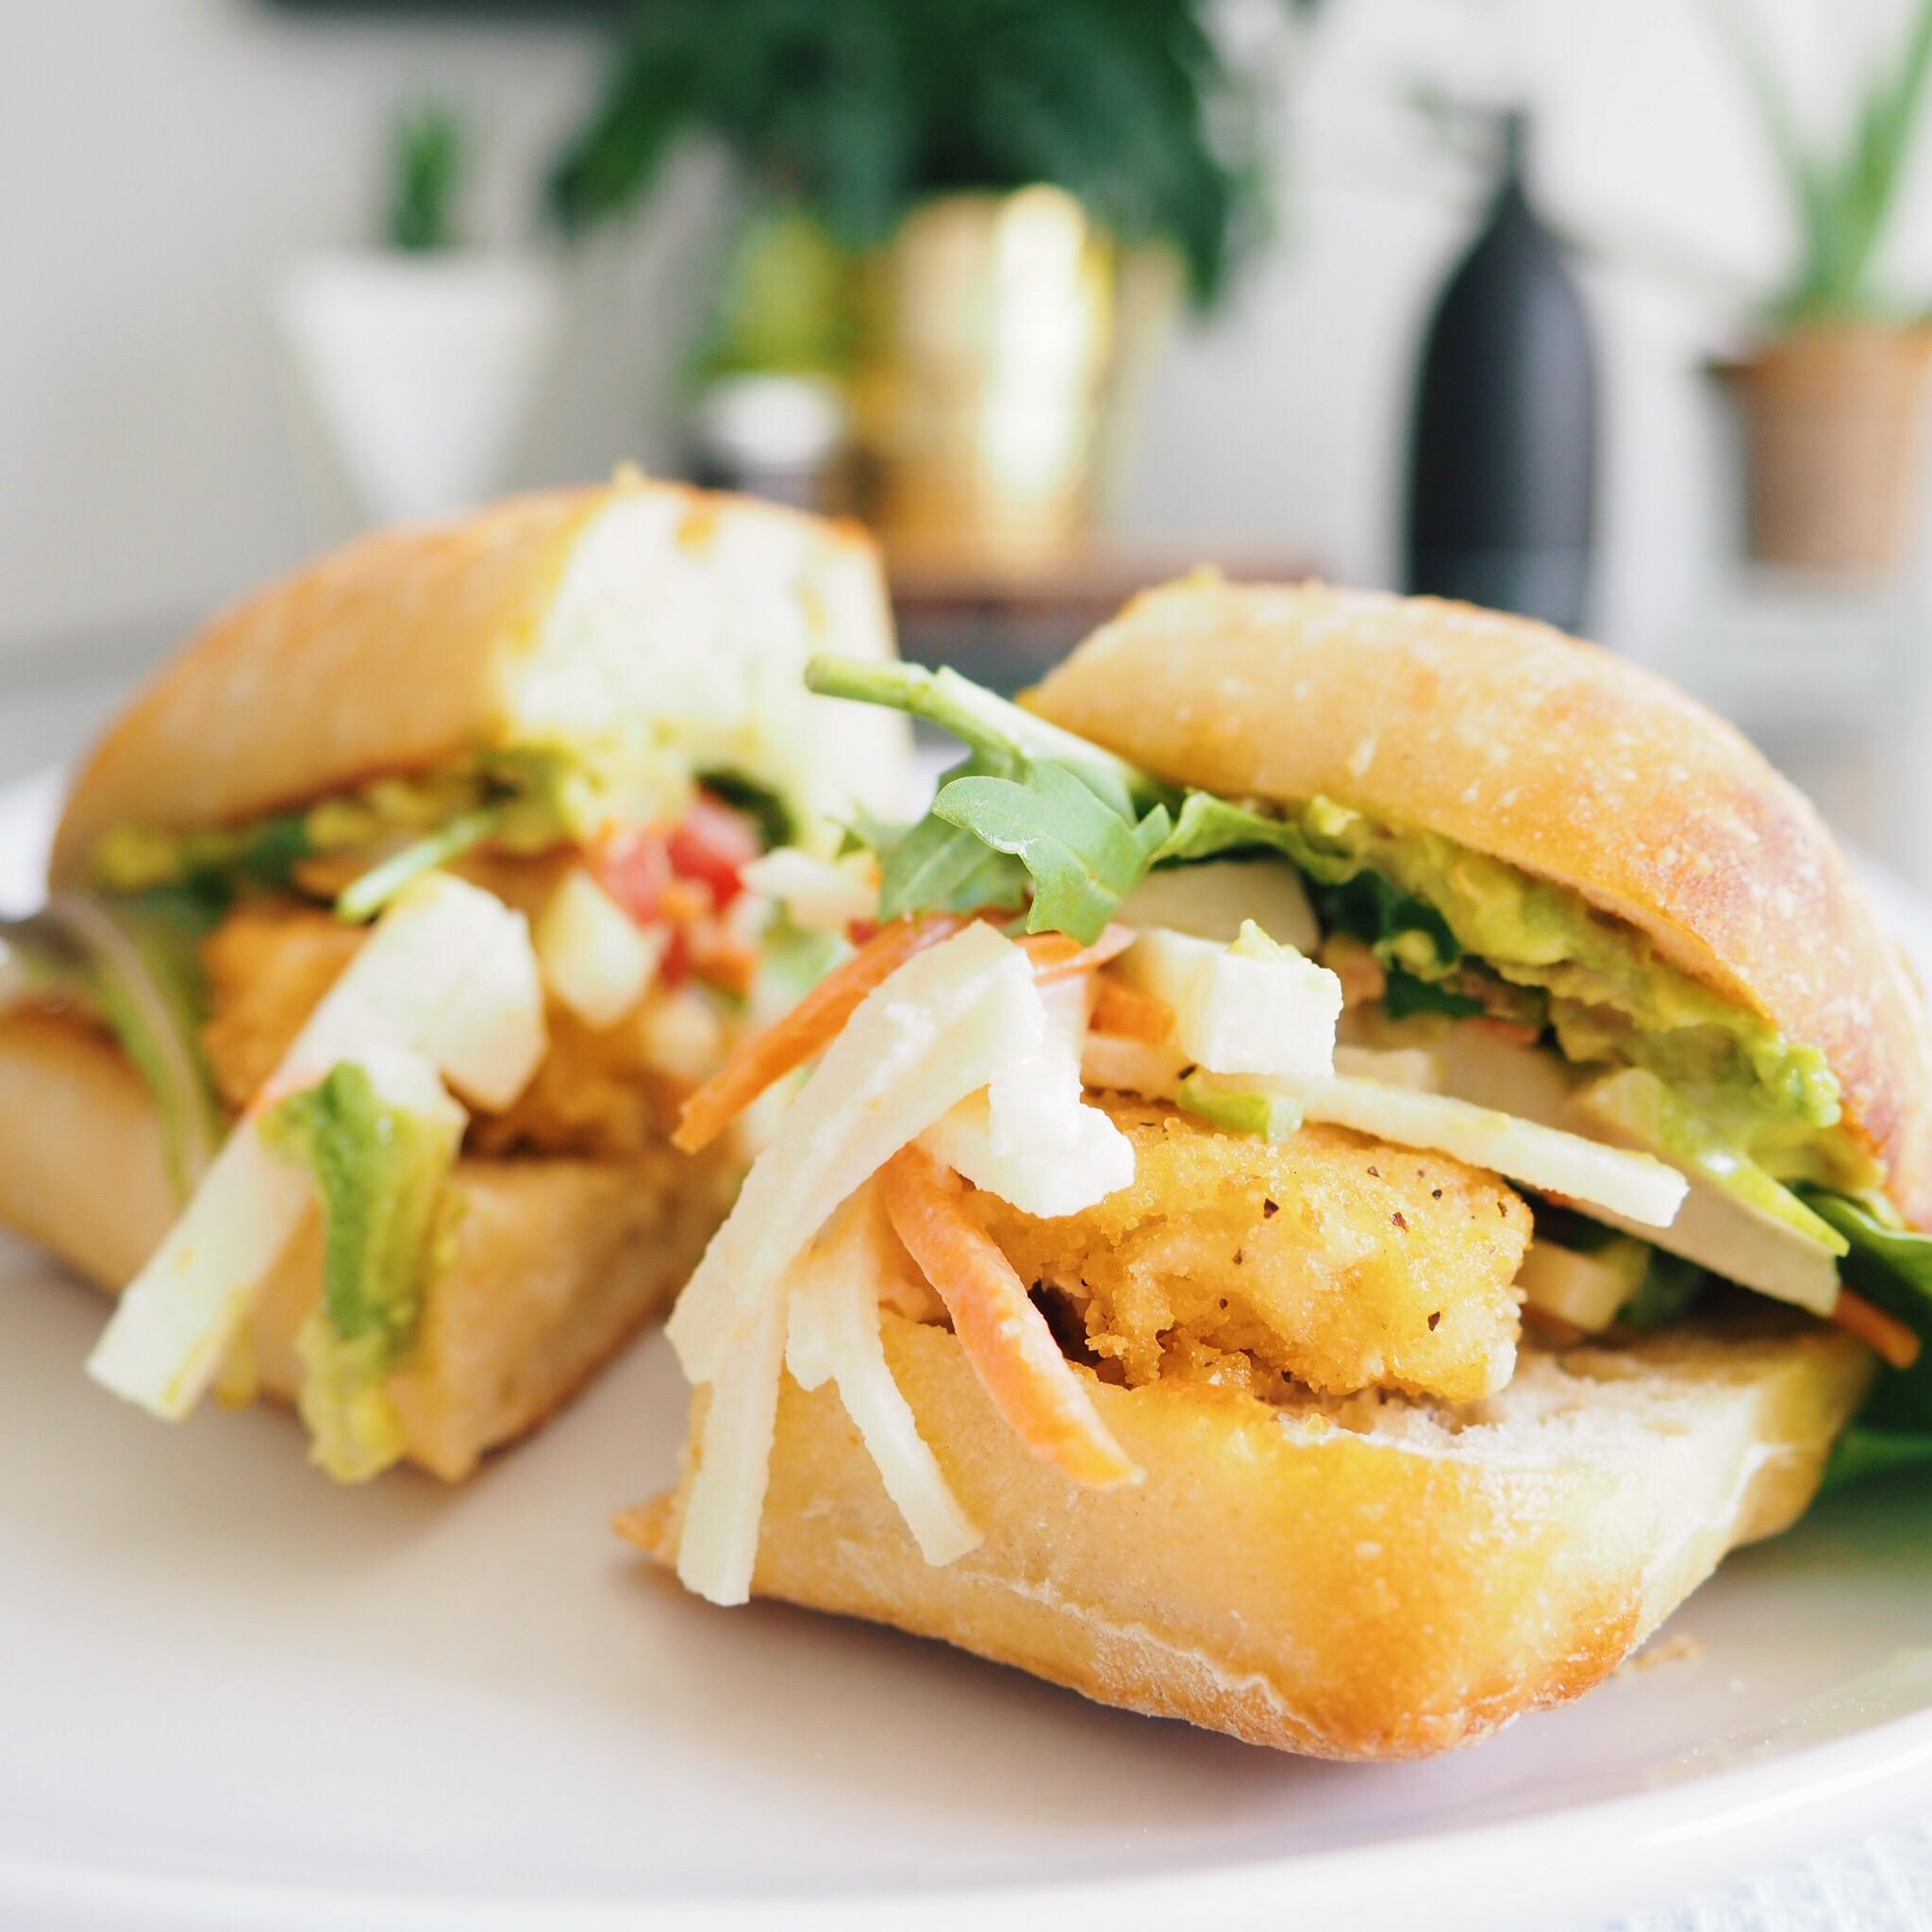 Vegan Crispy Chicken Sandwich.jpg